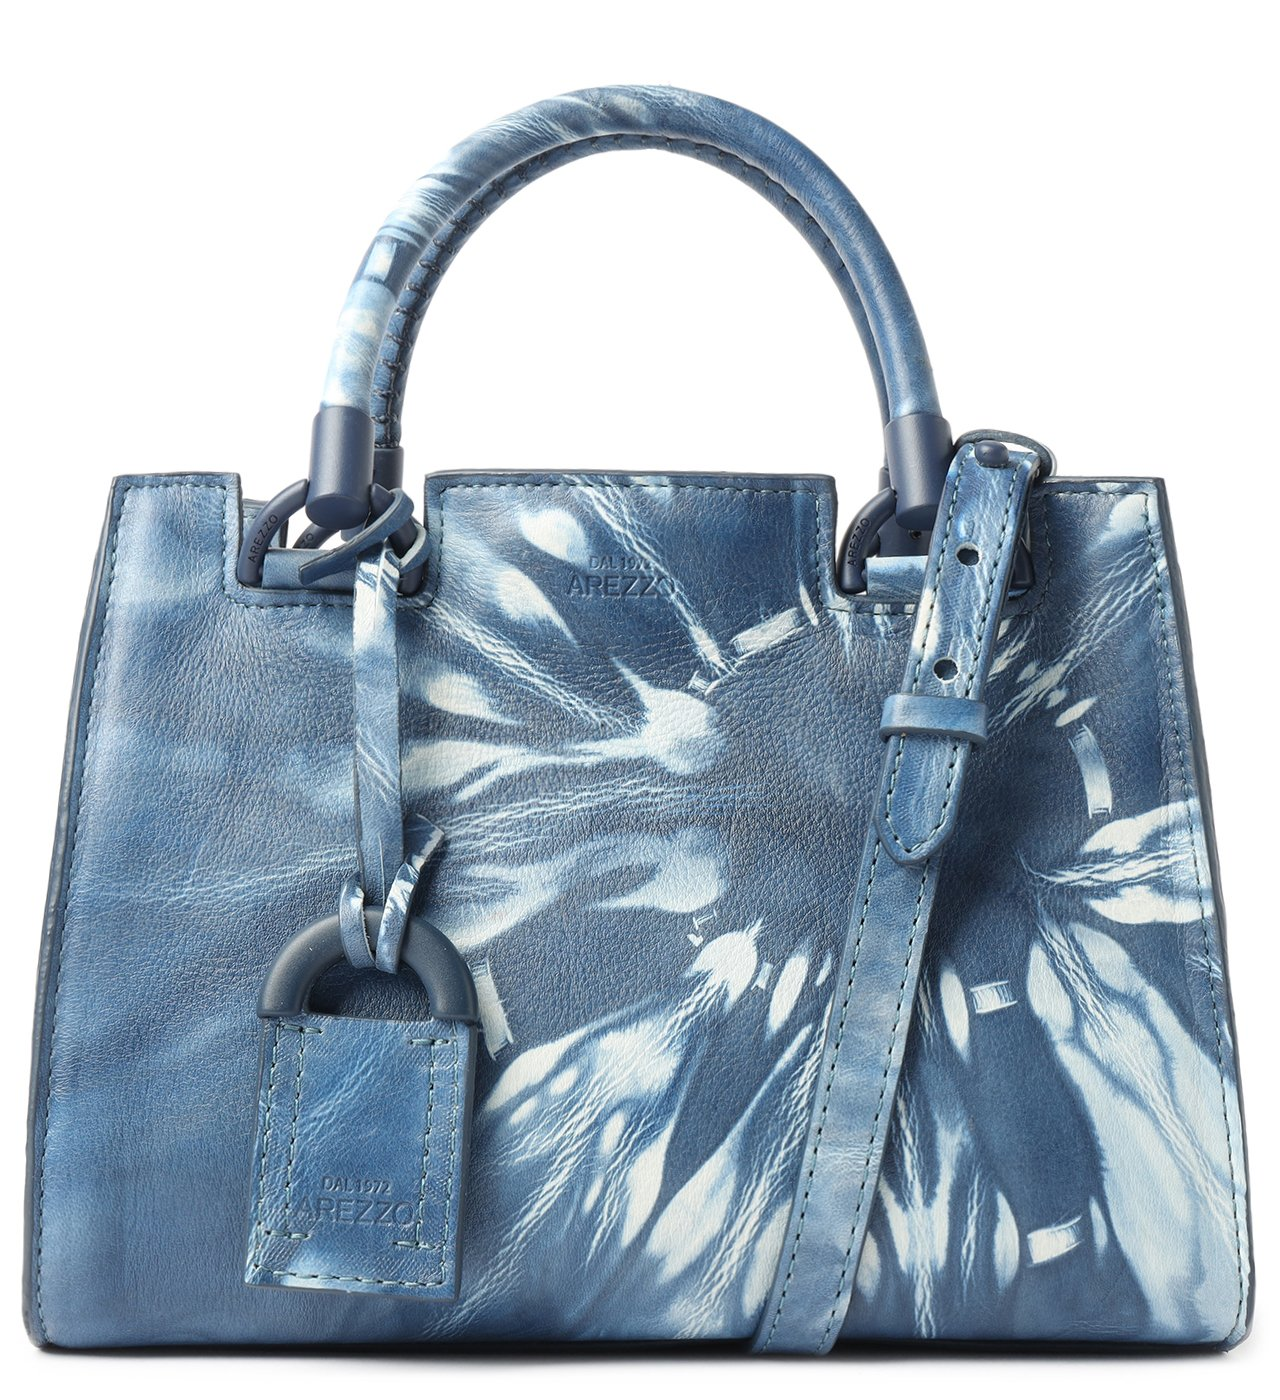 Bolsa Tote Azul Couro Tie-Dye Clara Média | Arezzo